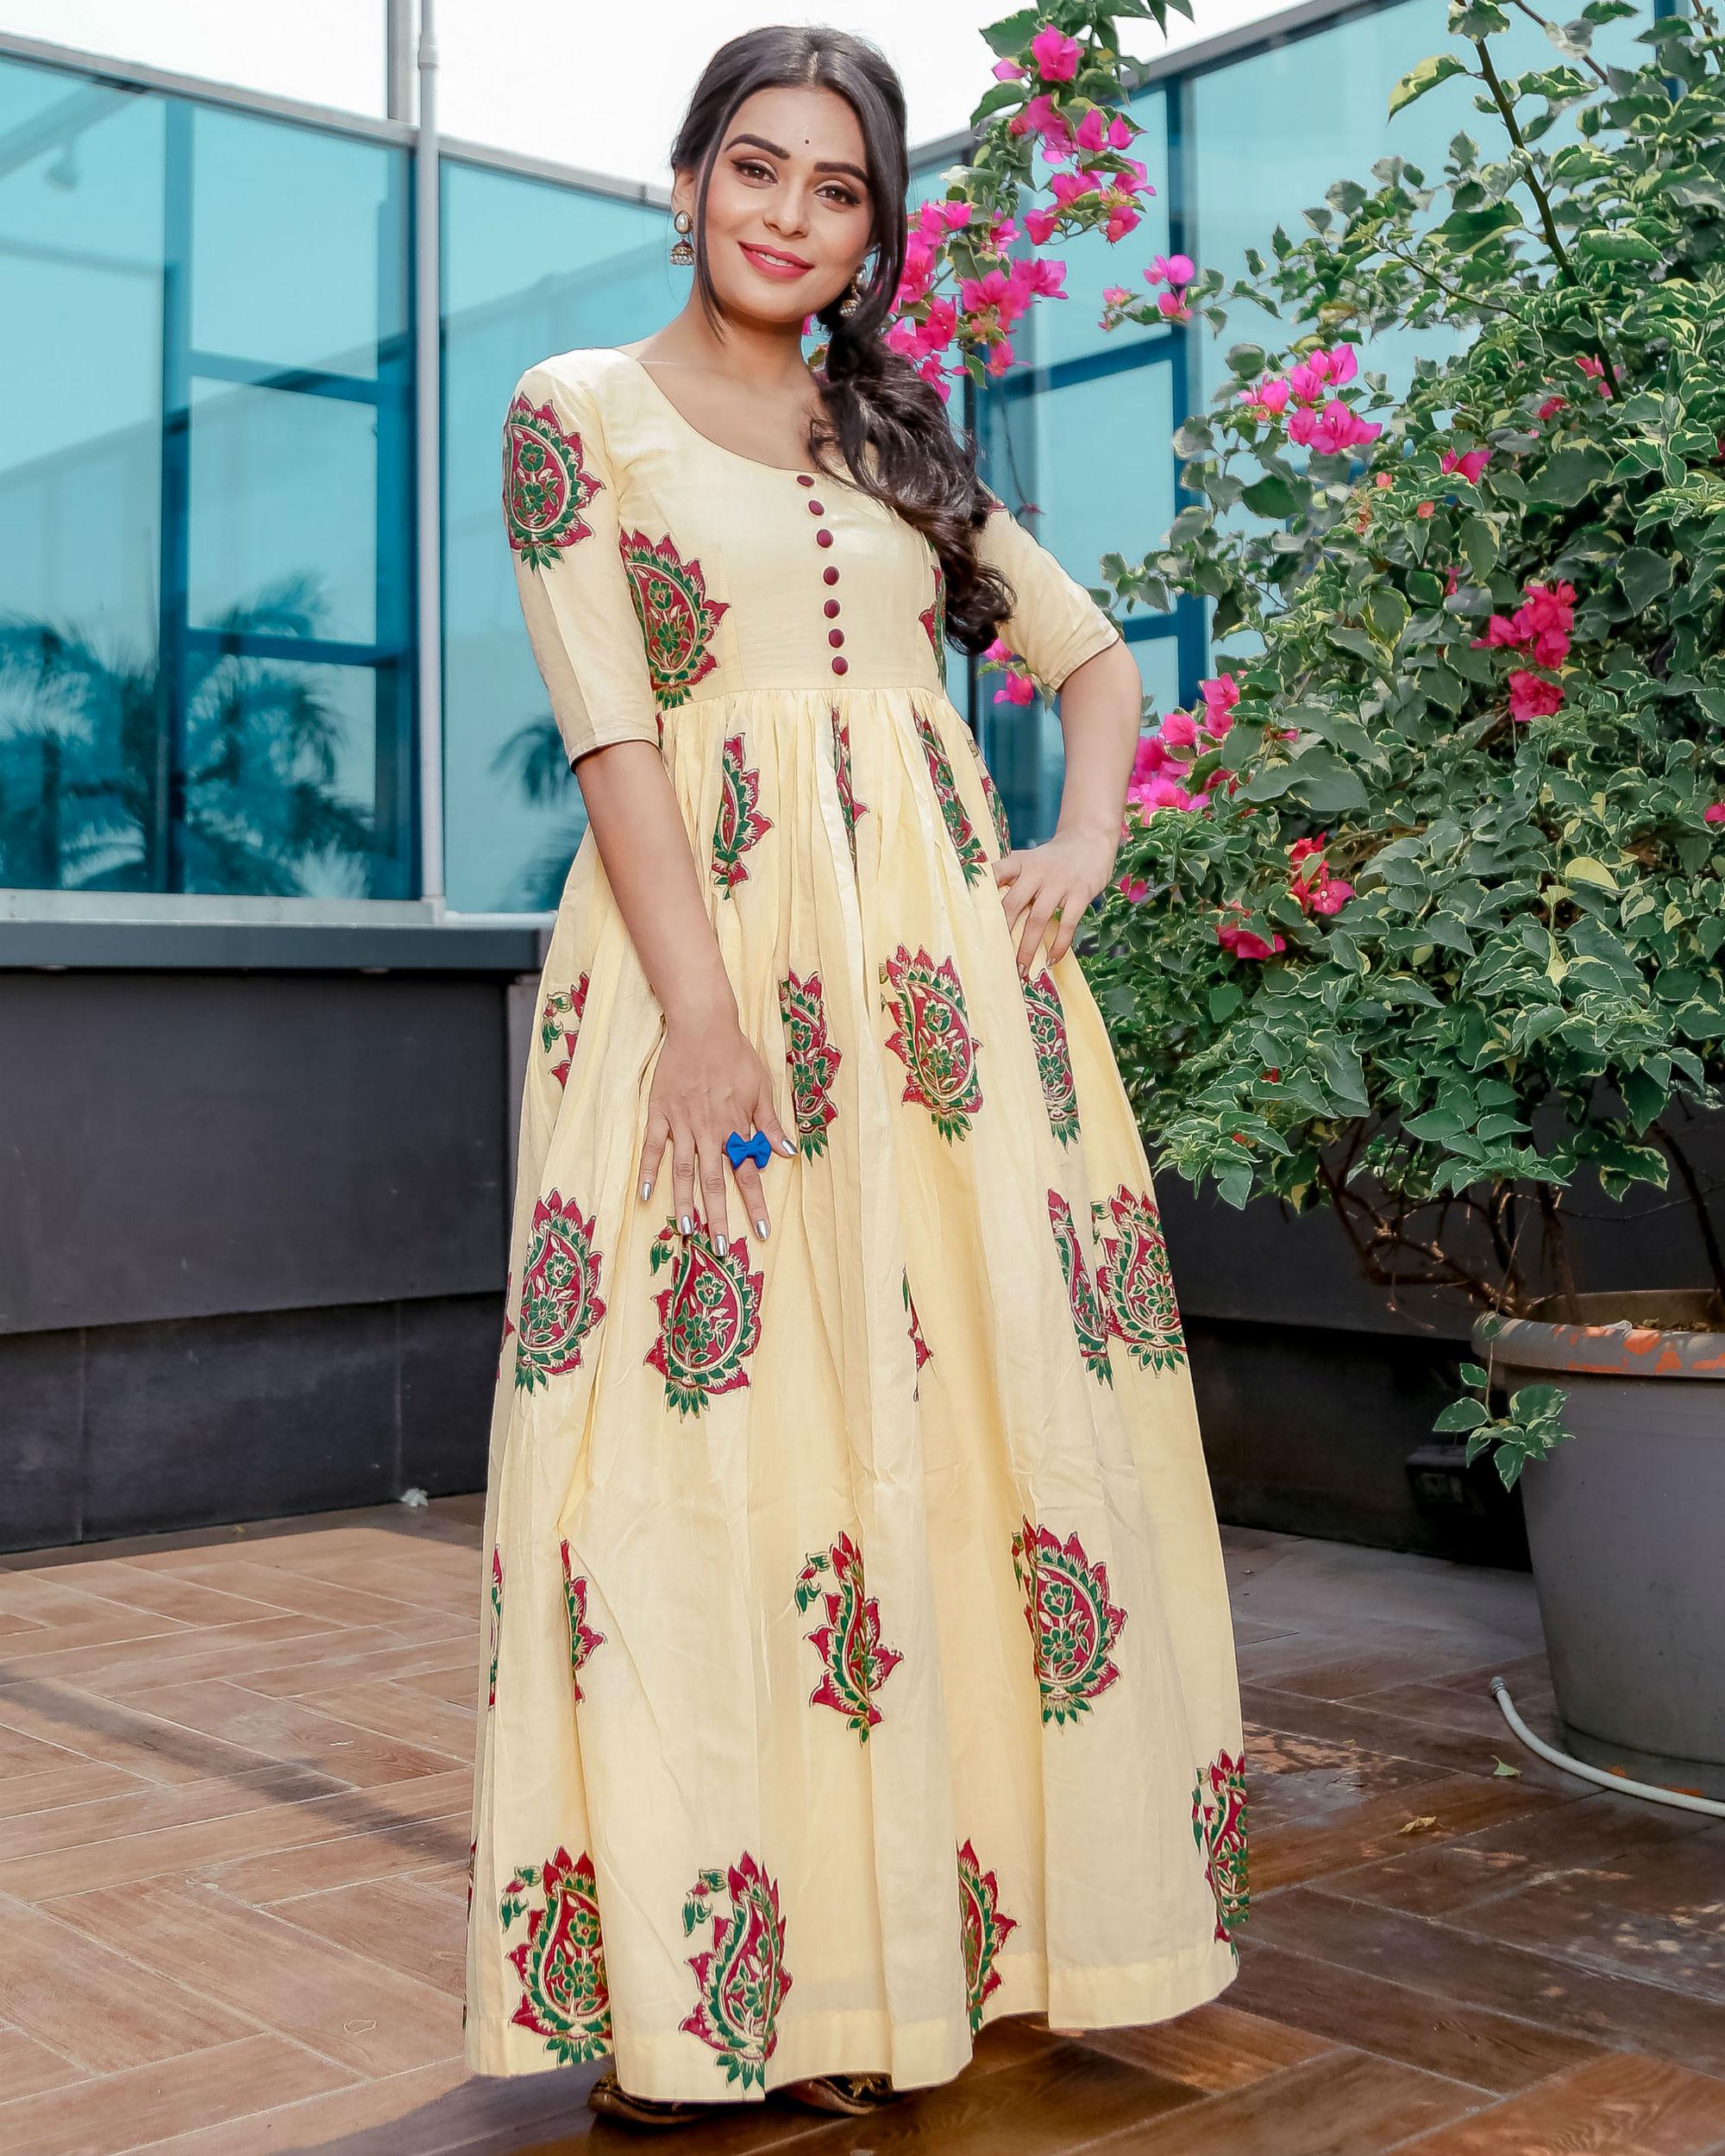 c457b2ba Cream mughal paisley print dress by Aachho | The Secret Label